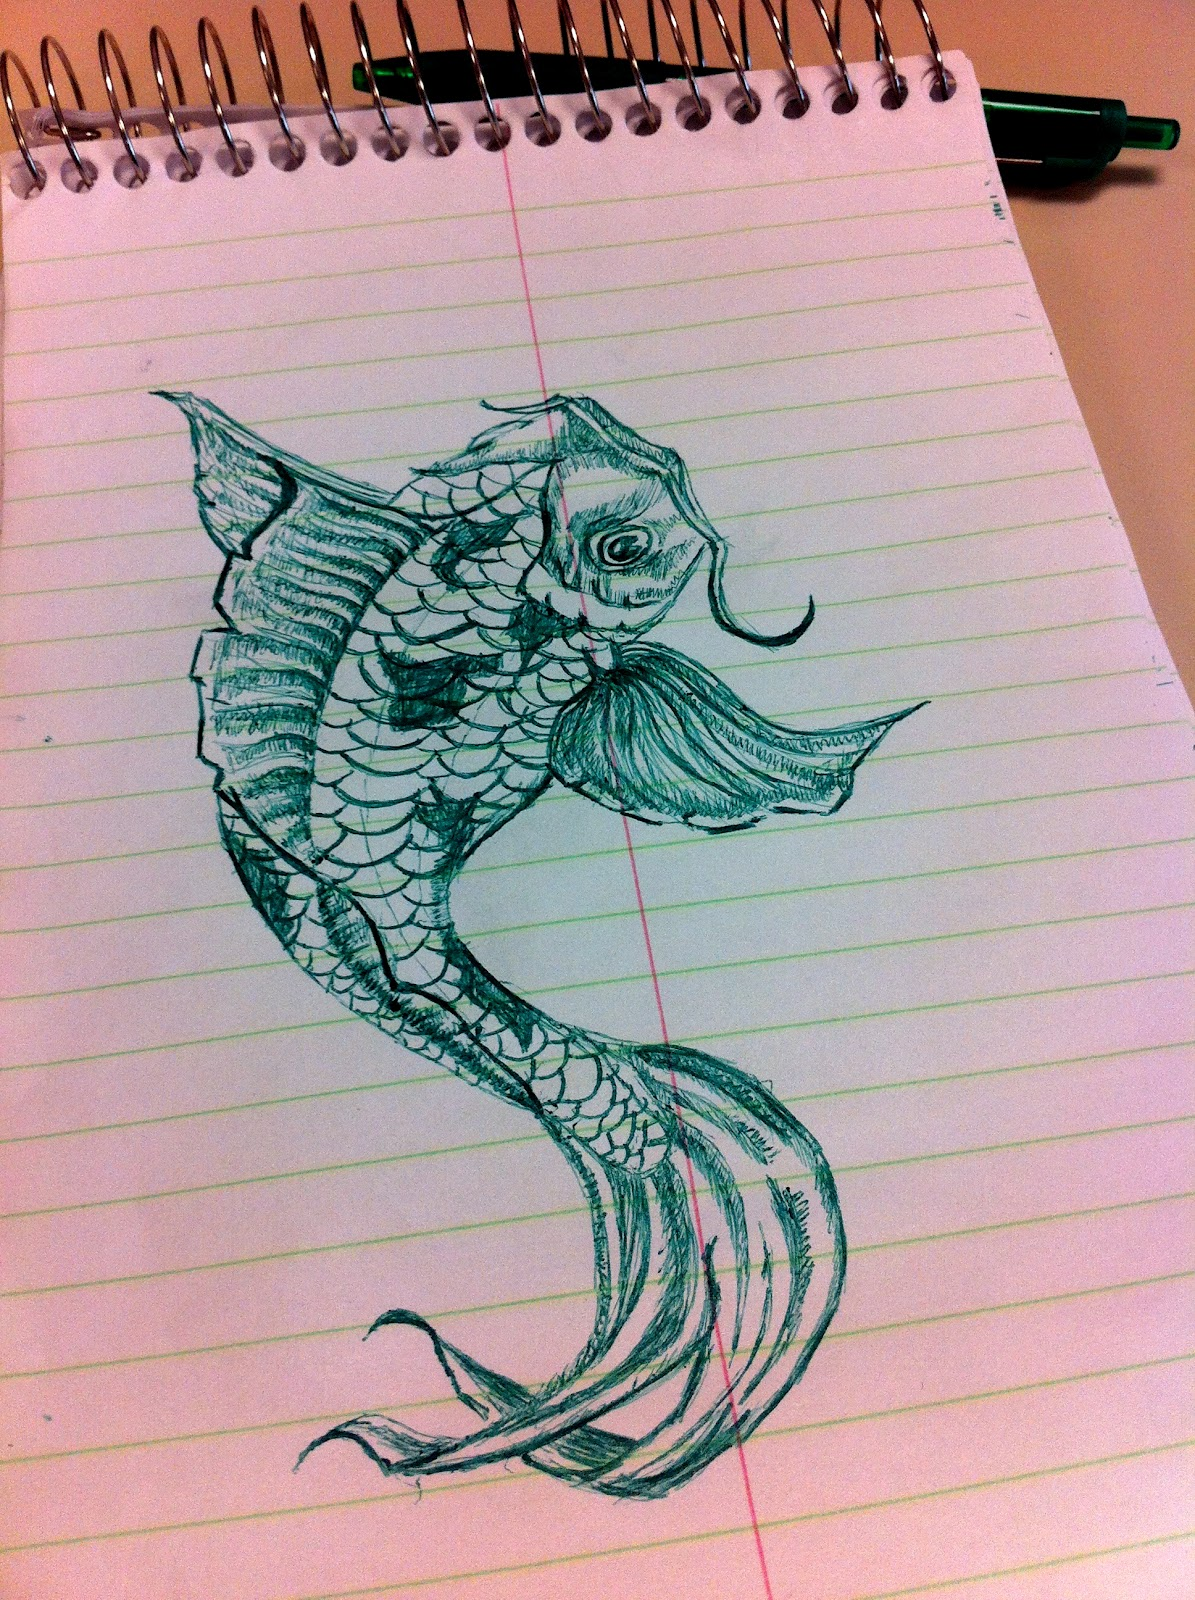 Pz c koi fish for Koi dragon meaning